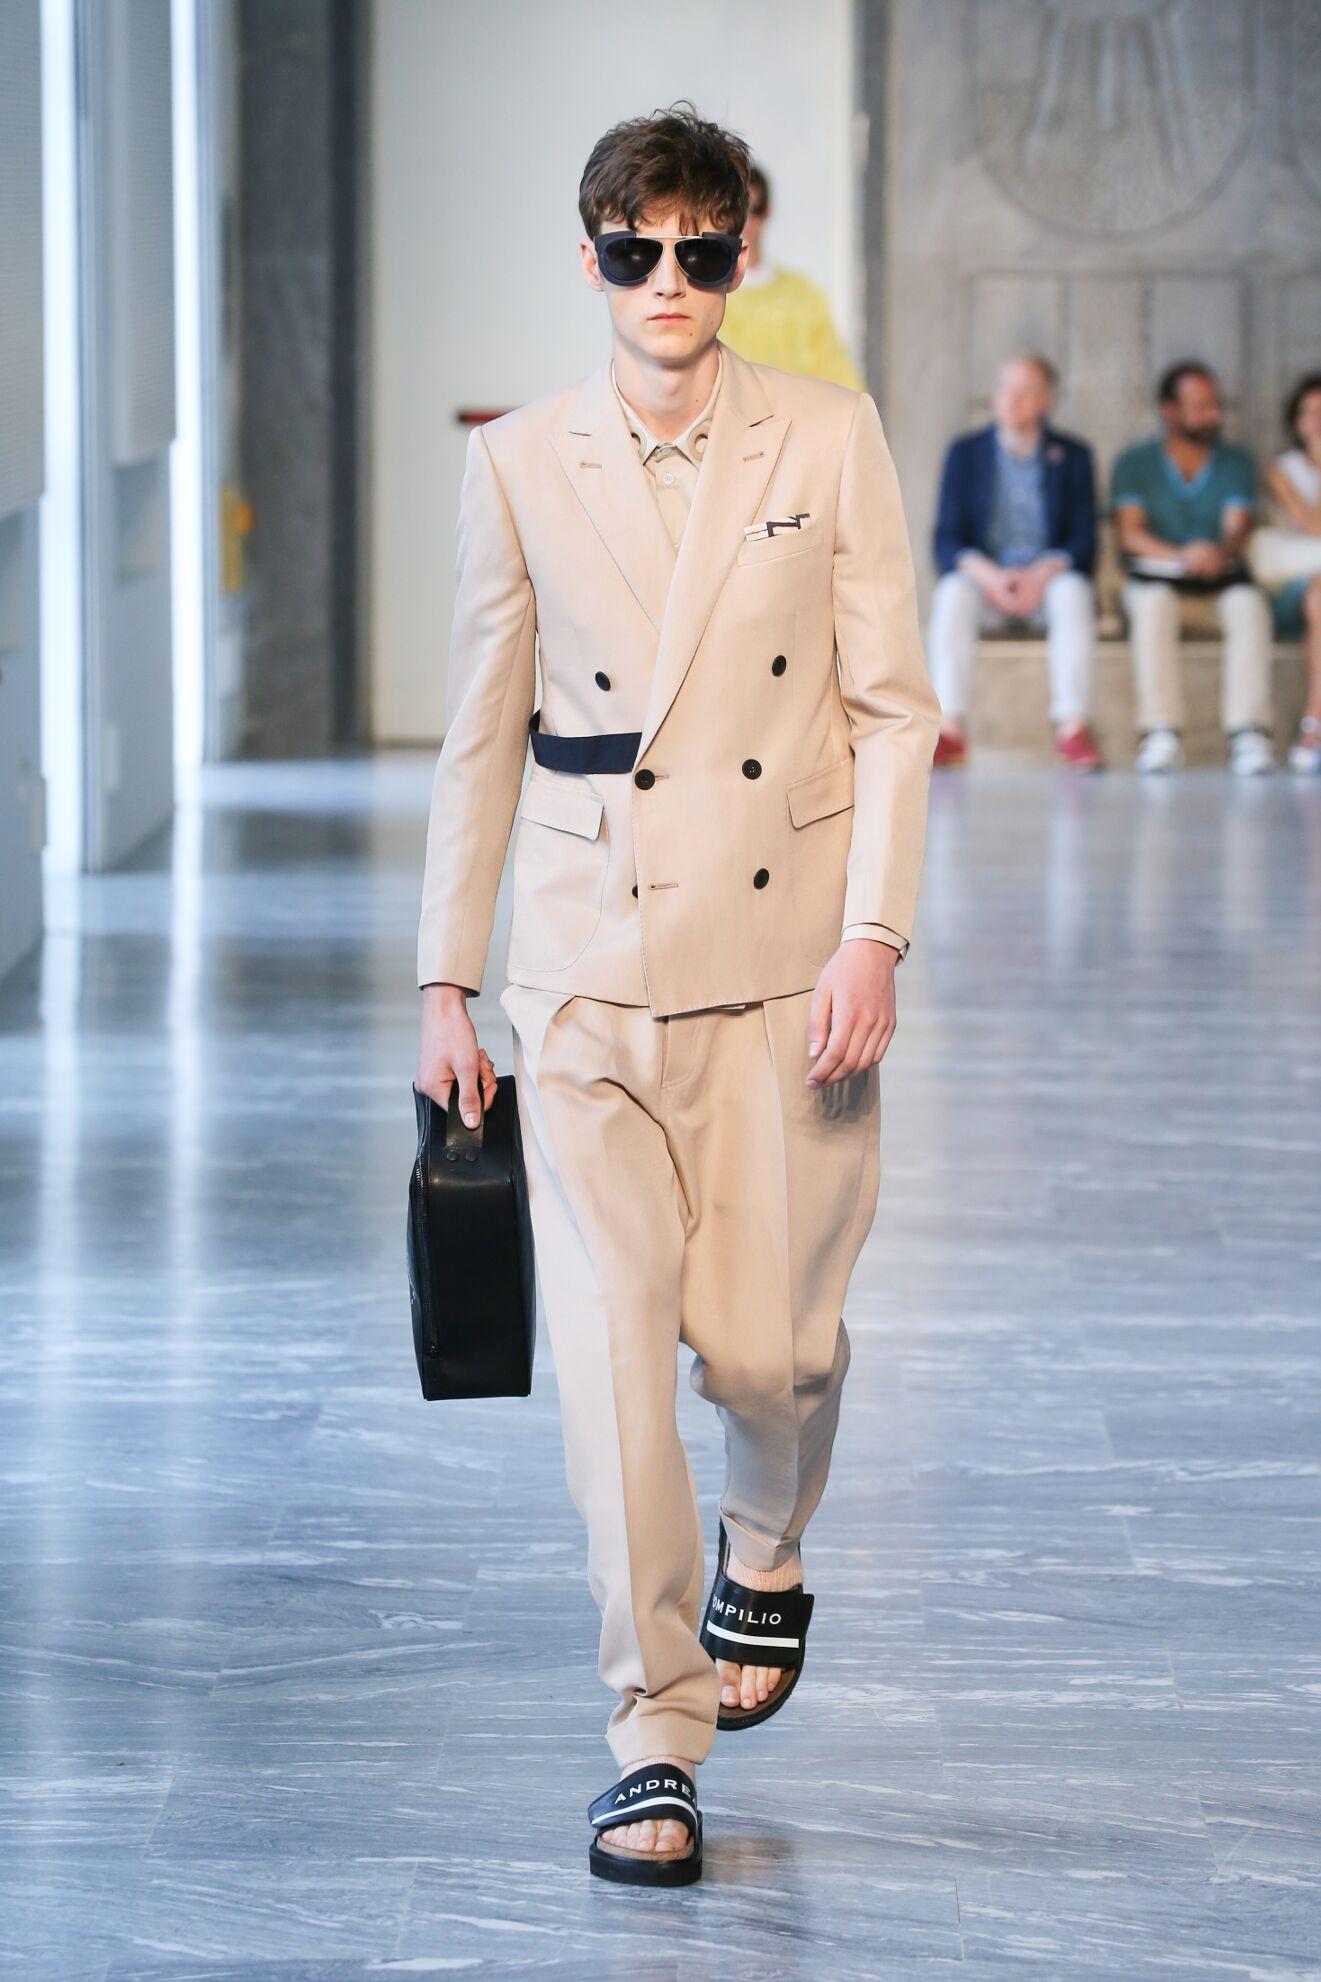 Summer 2015 Man Trends Andrea Pompilio